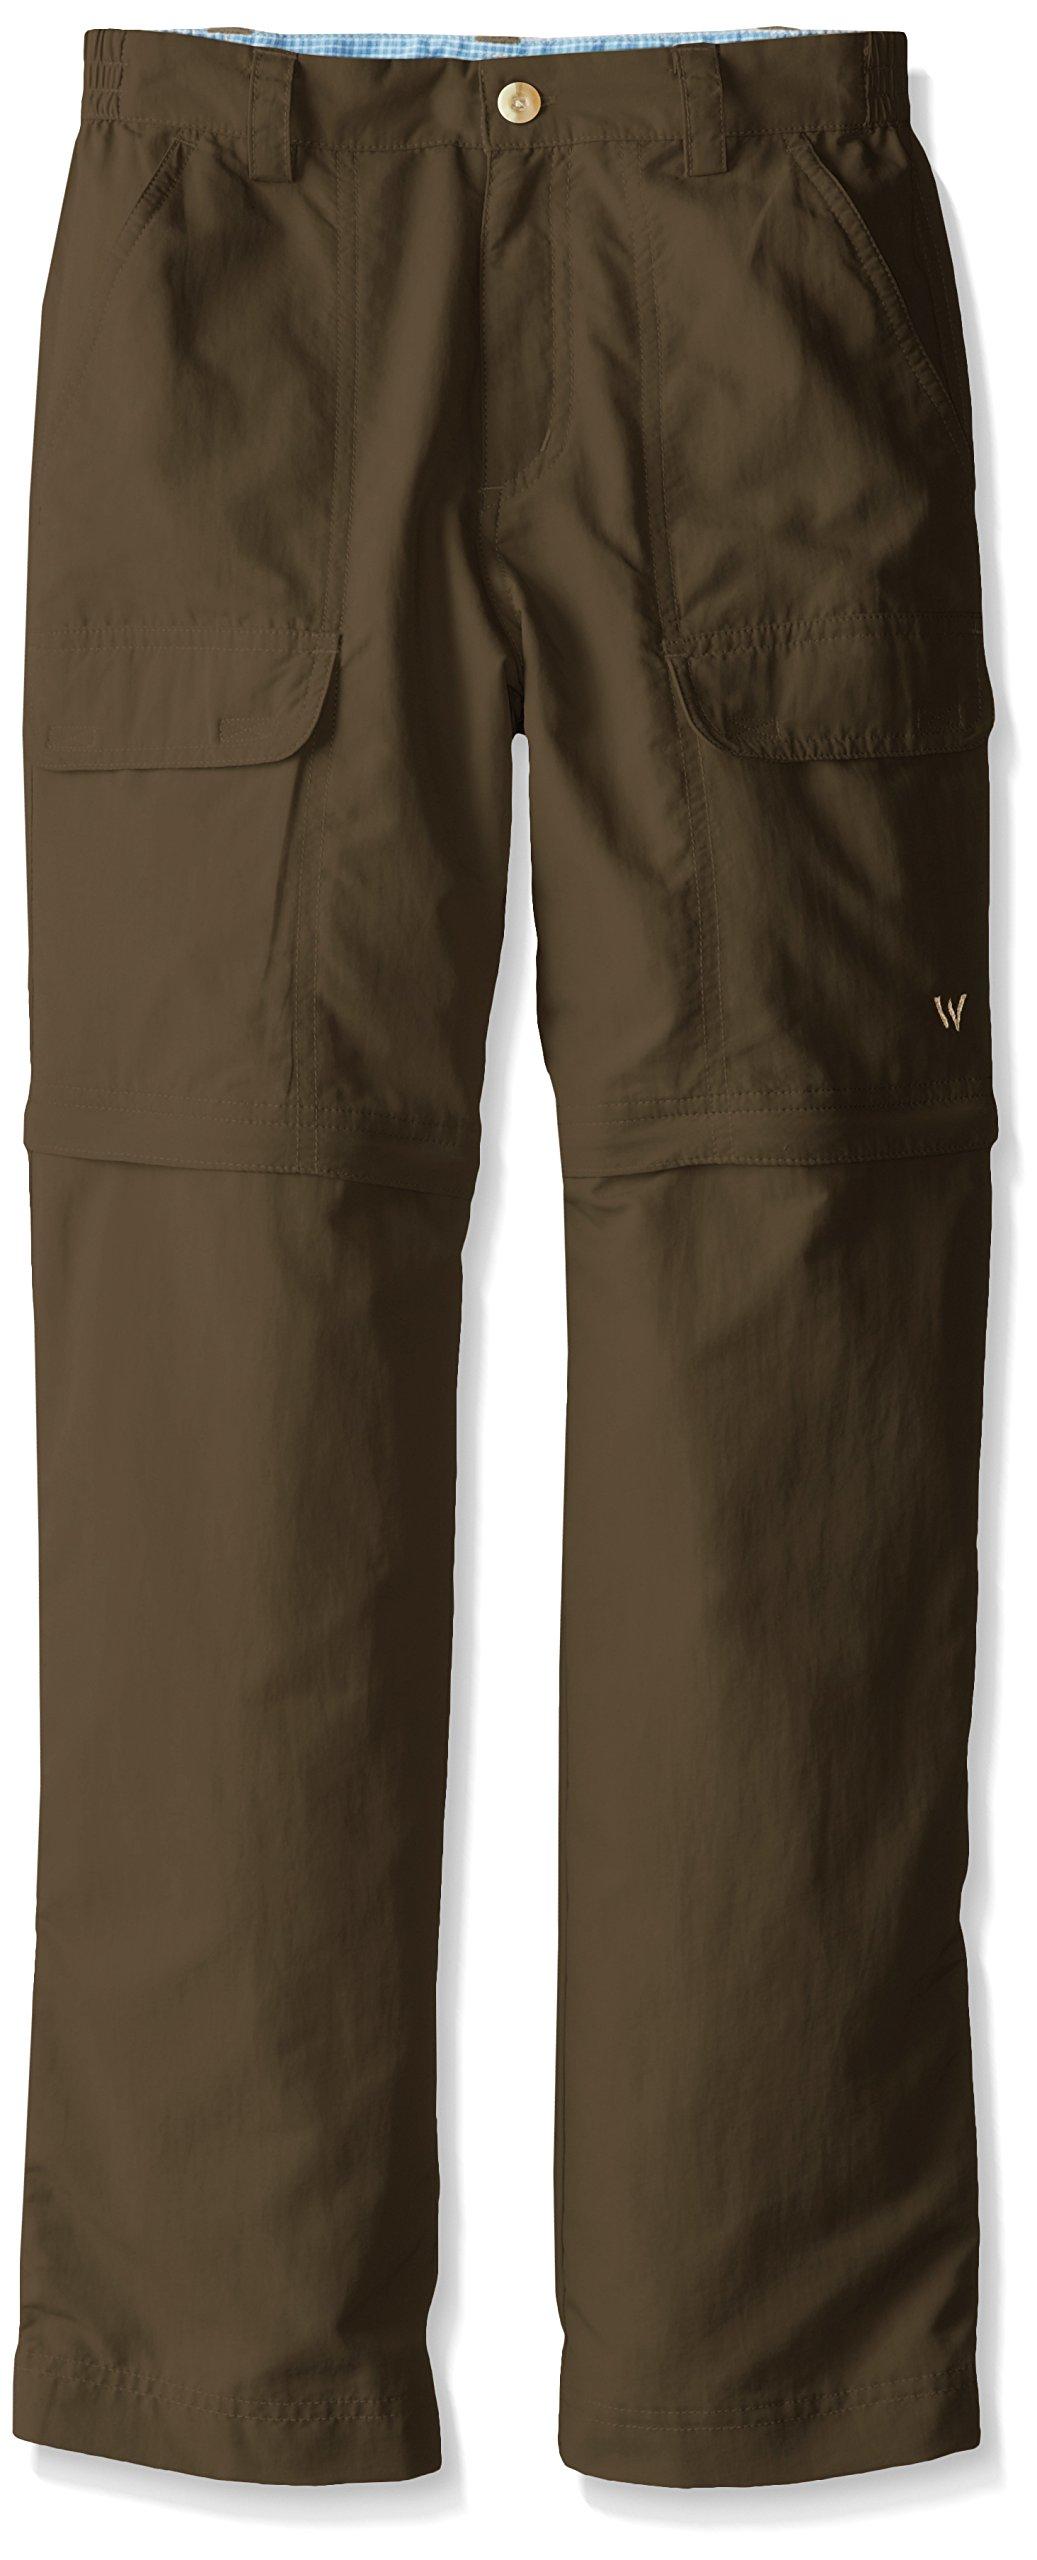 White Sierra Standard Trail Convertible Pant (Little Big Kids), Bark, Large by White Sierra